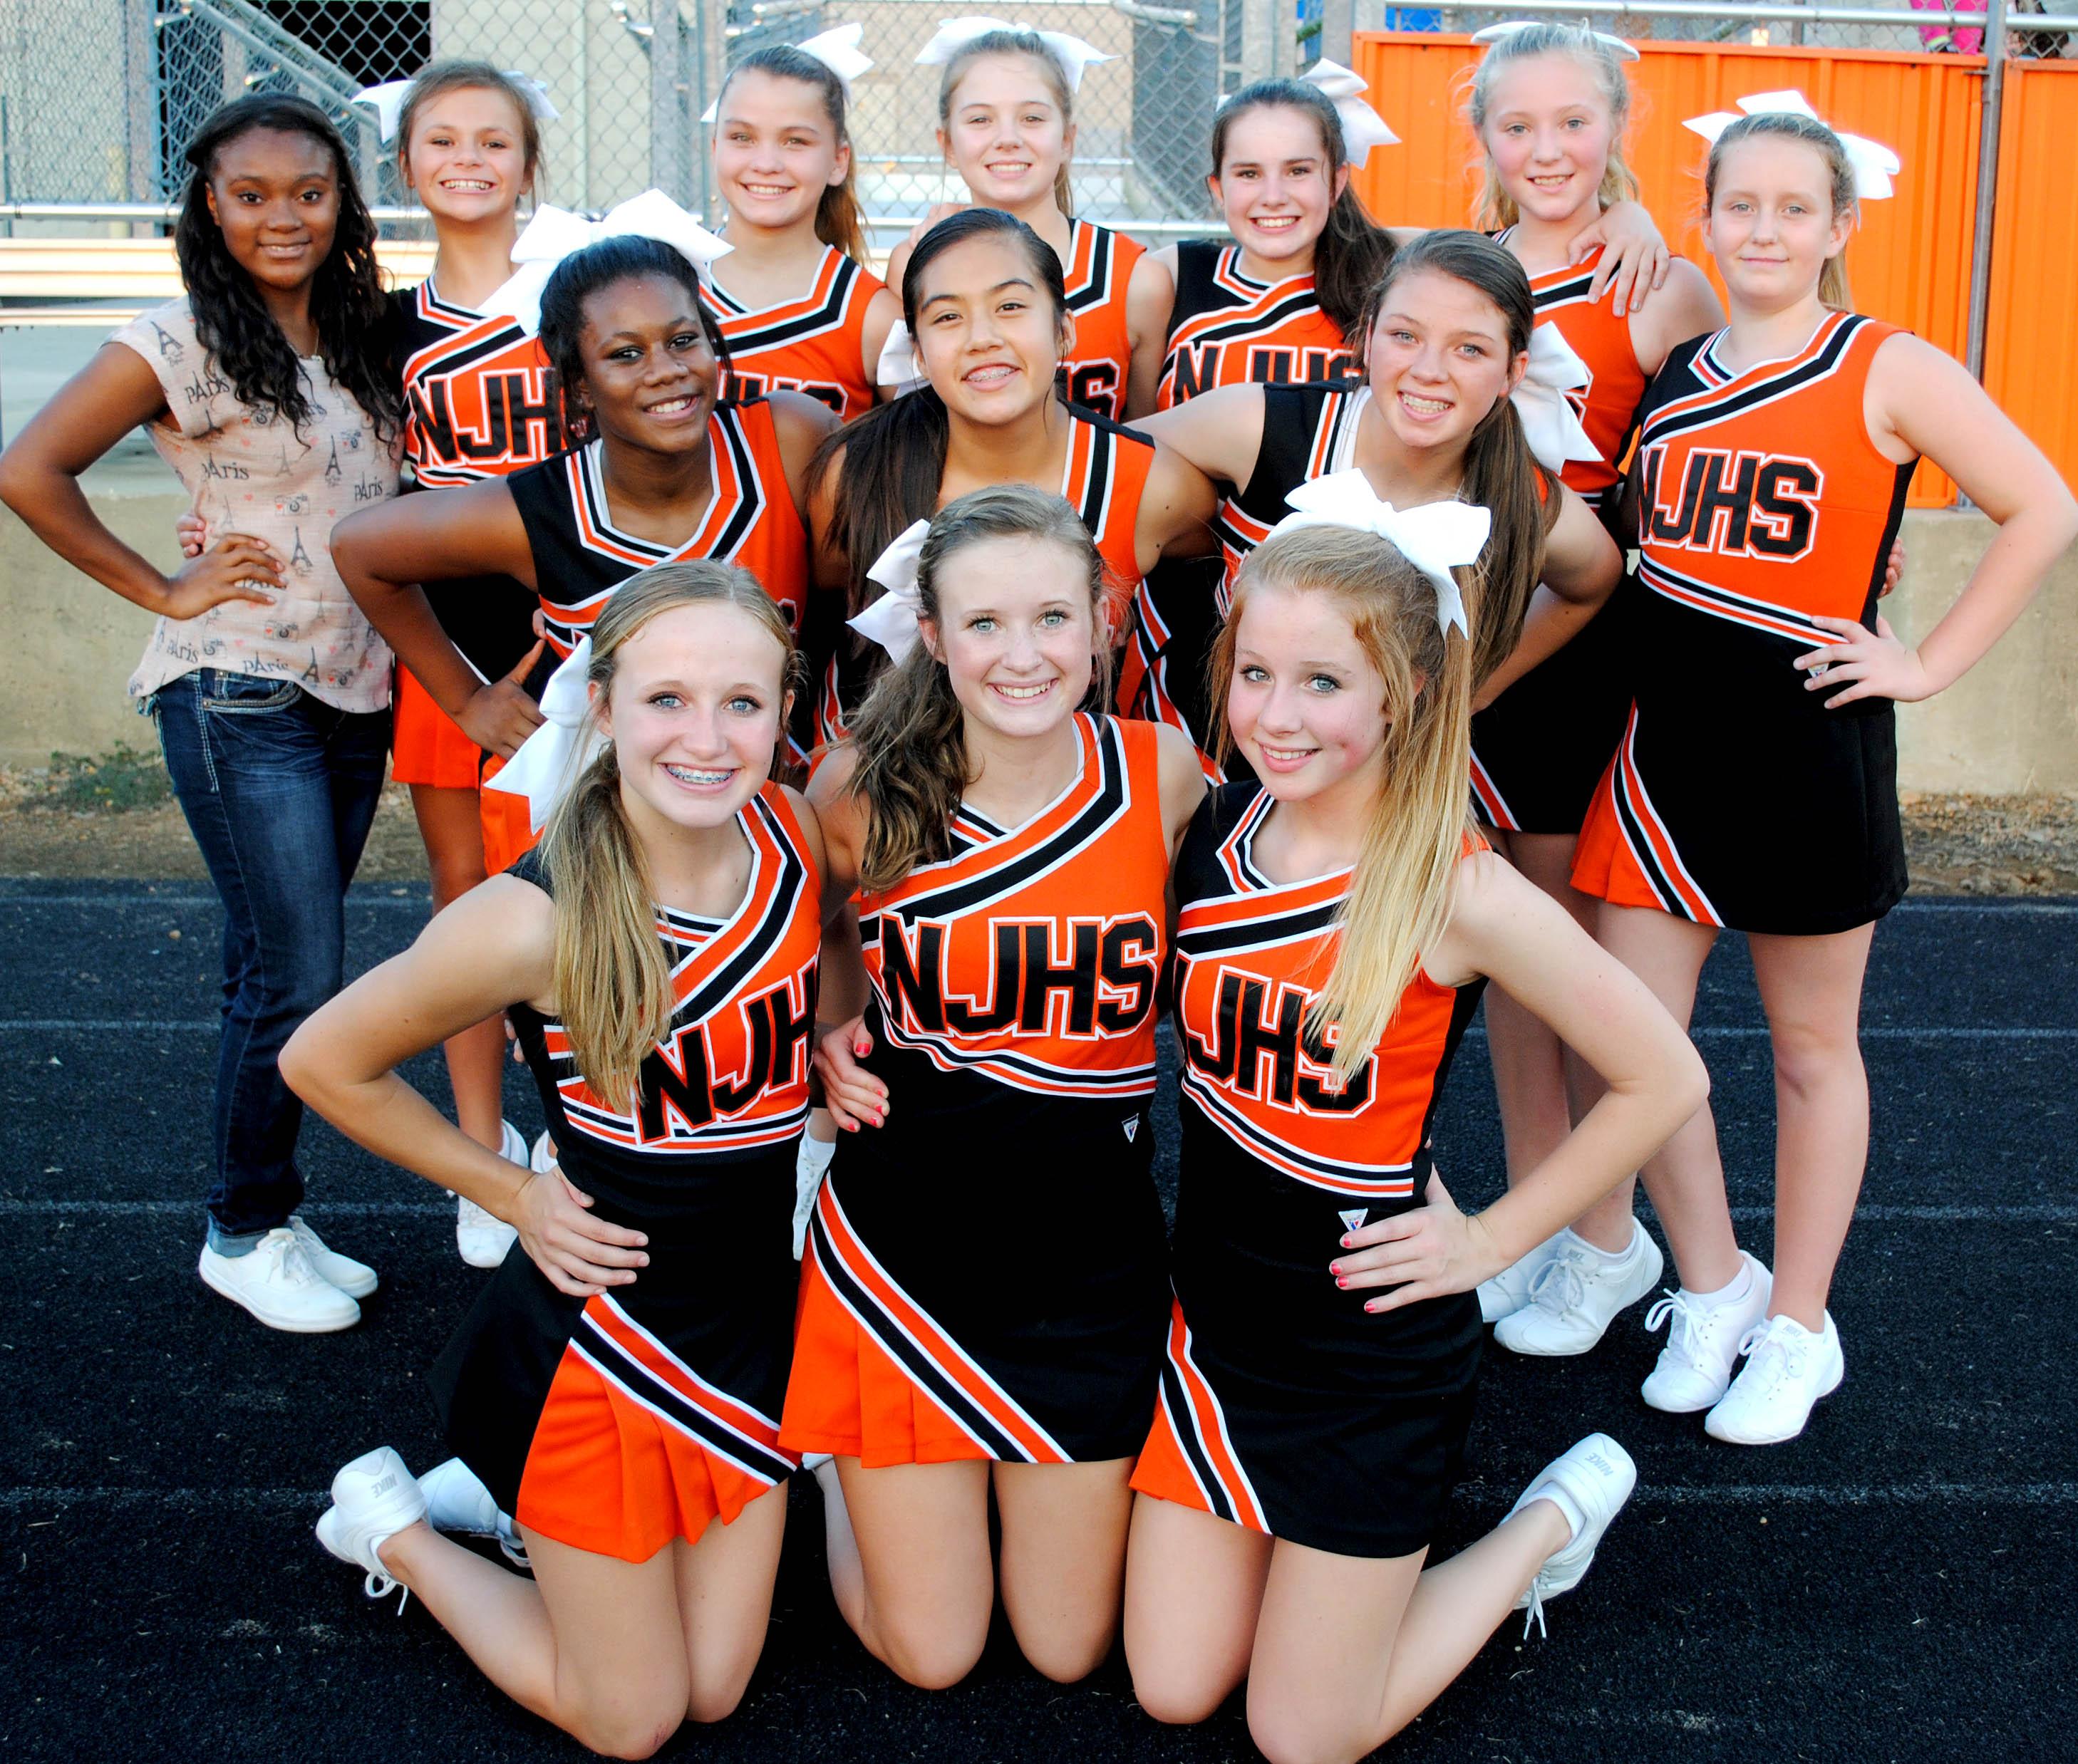 junior high cheer | Southwest Arkansas News